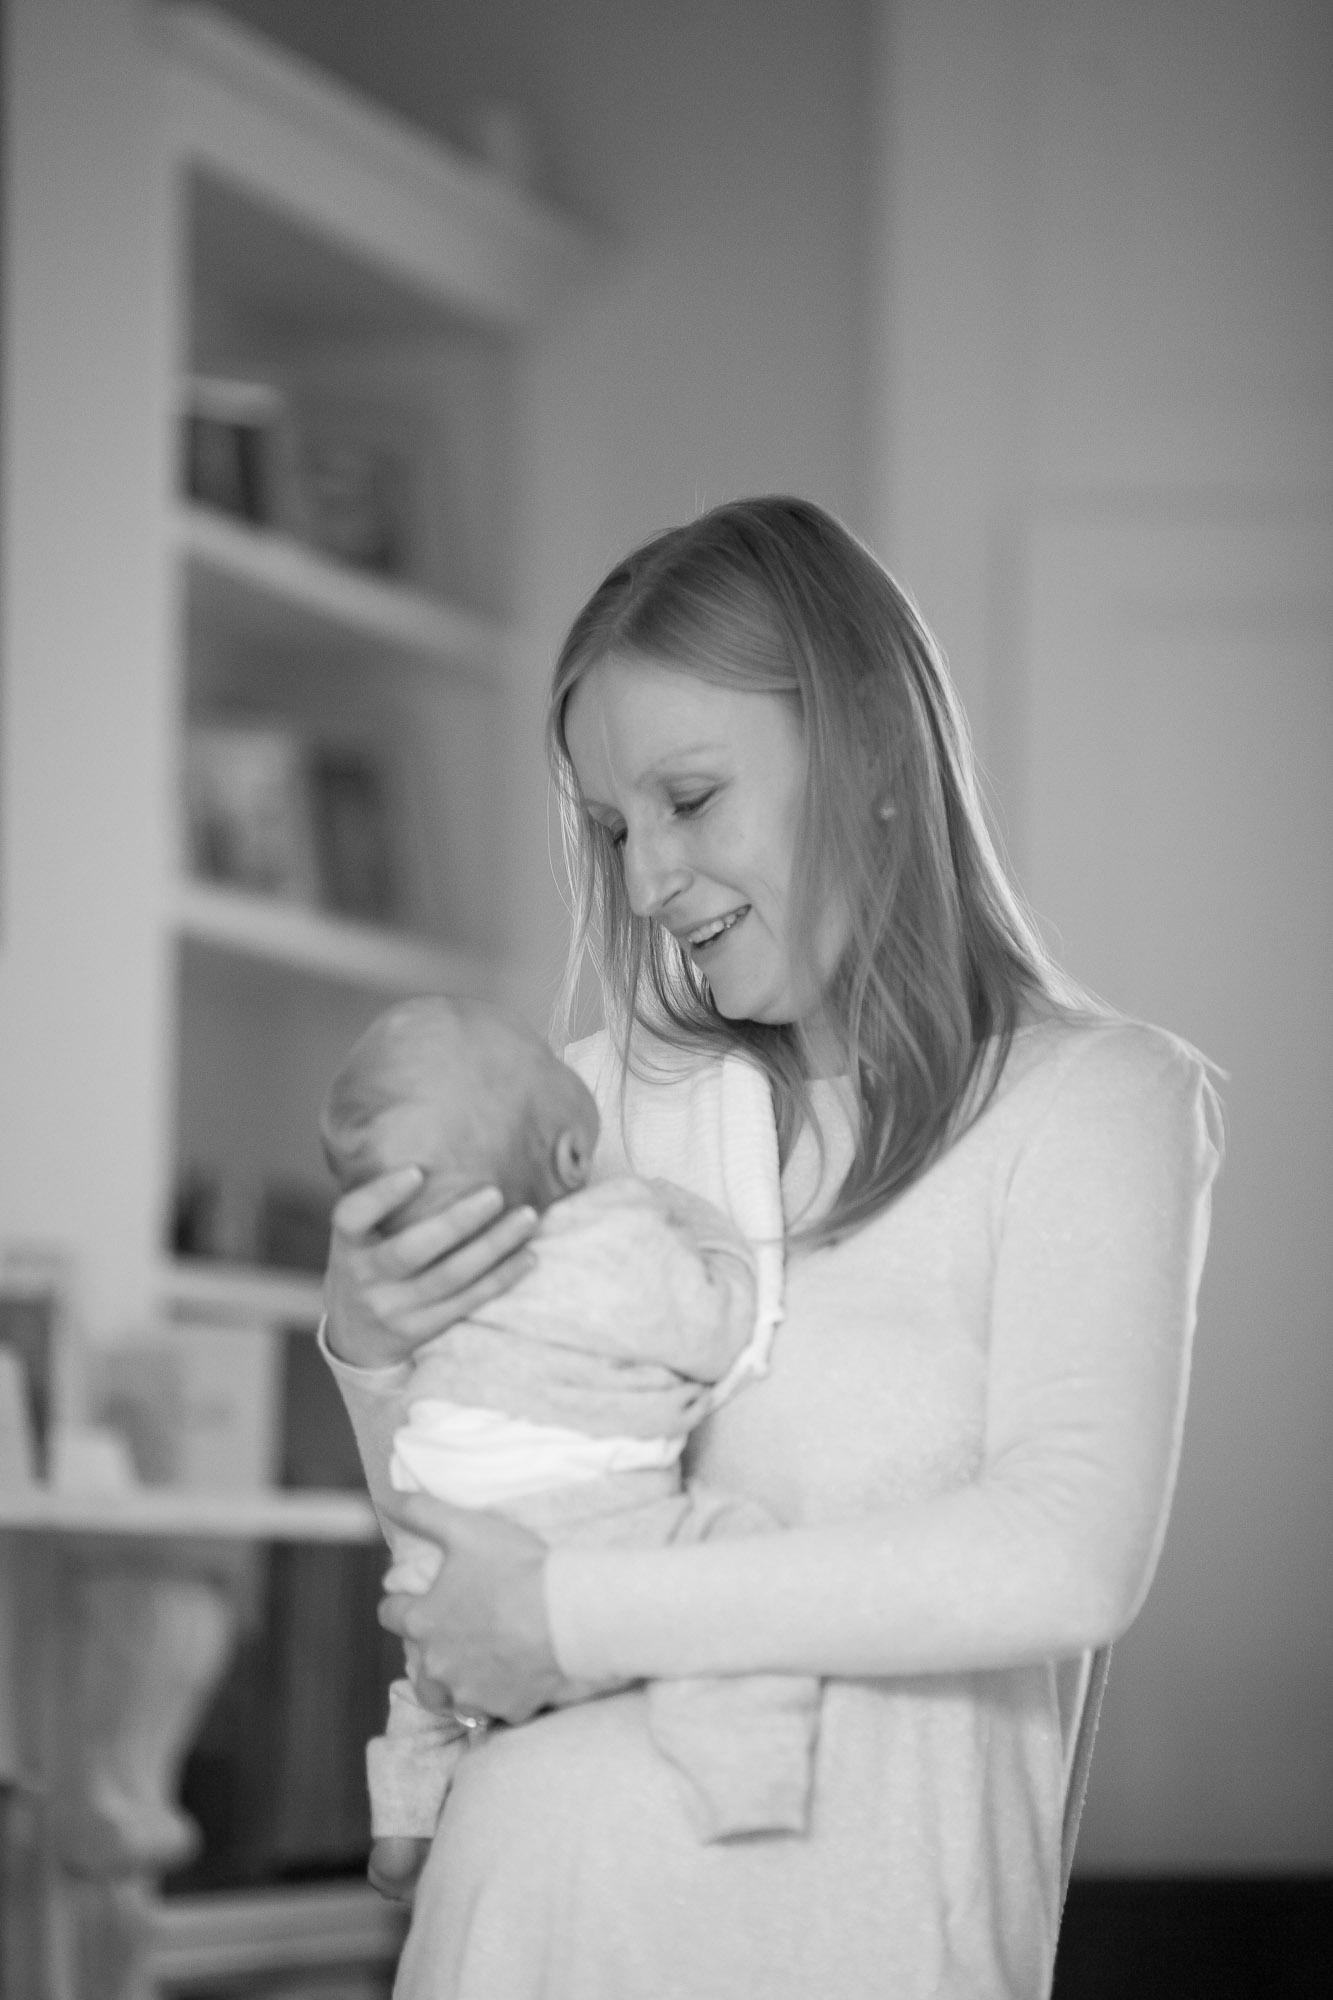 newborn-baby-family-portrait-photographer-003.jpg